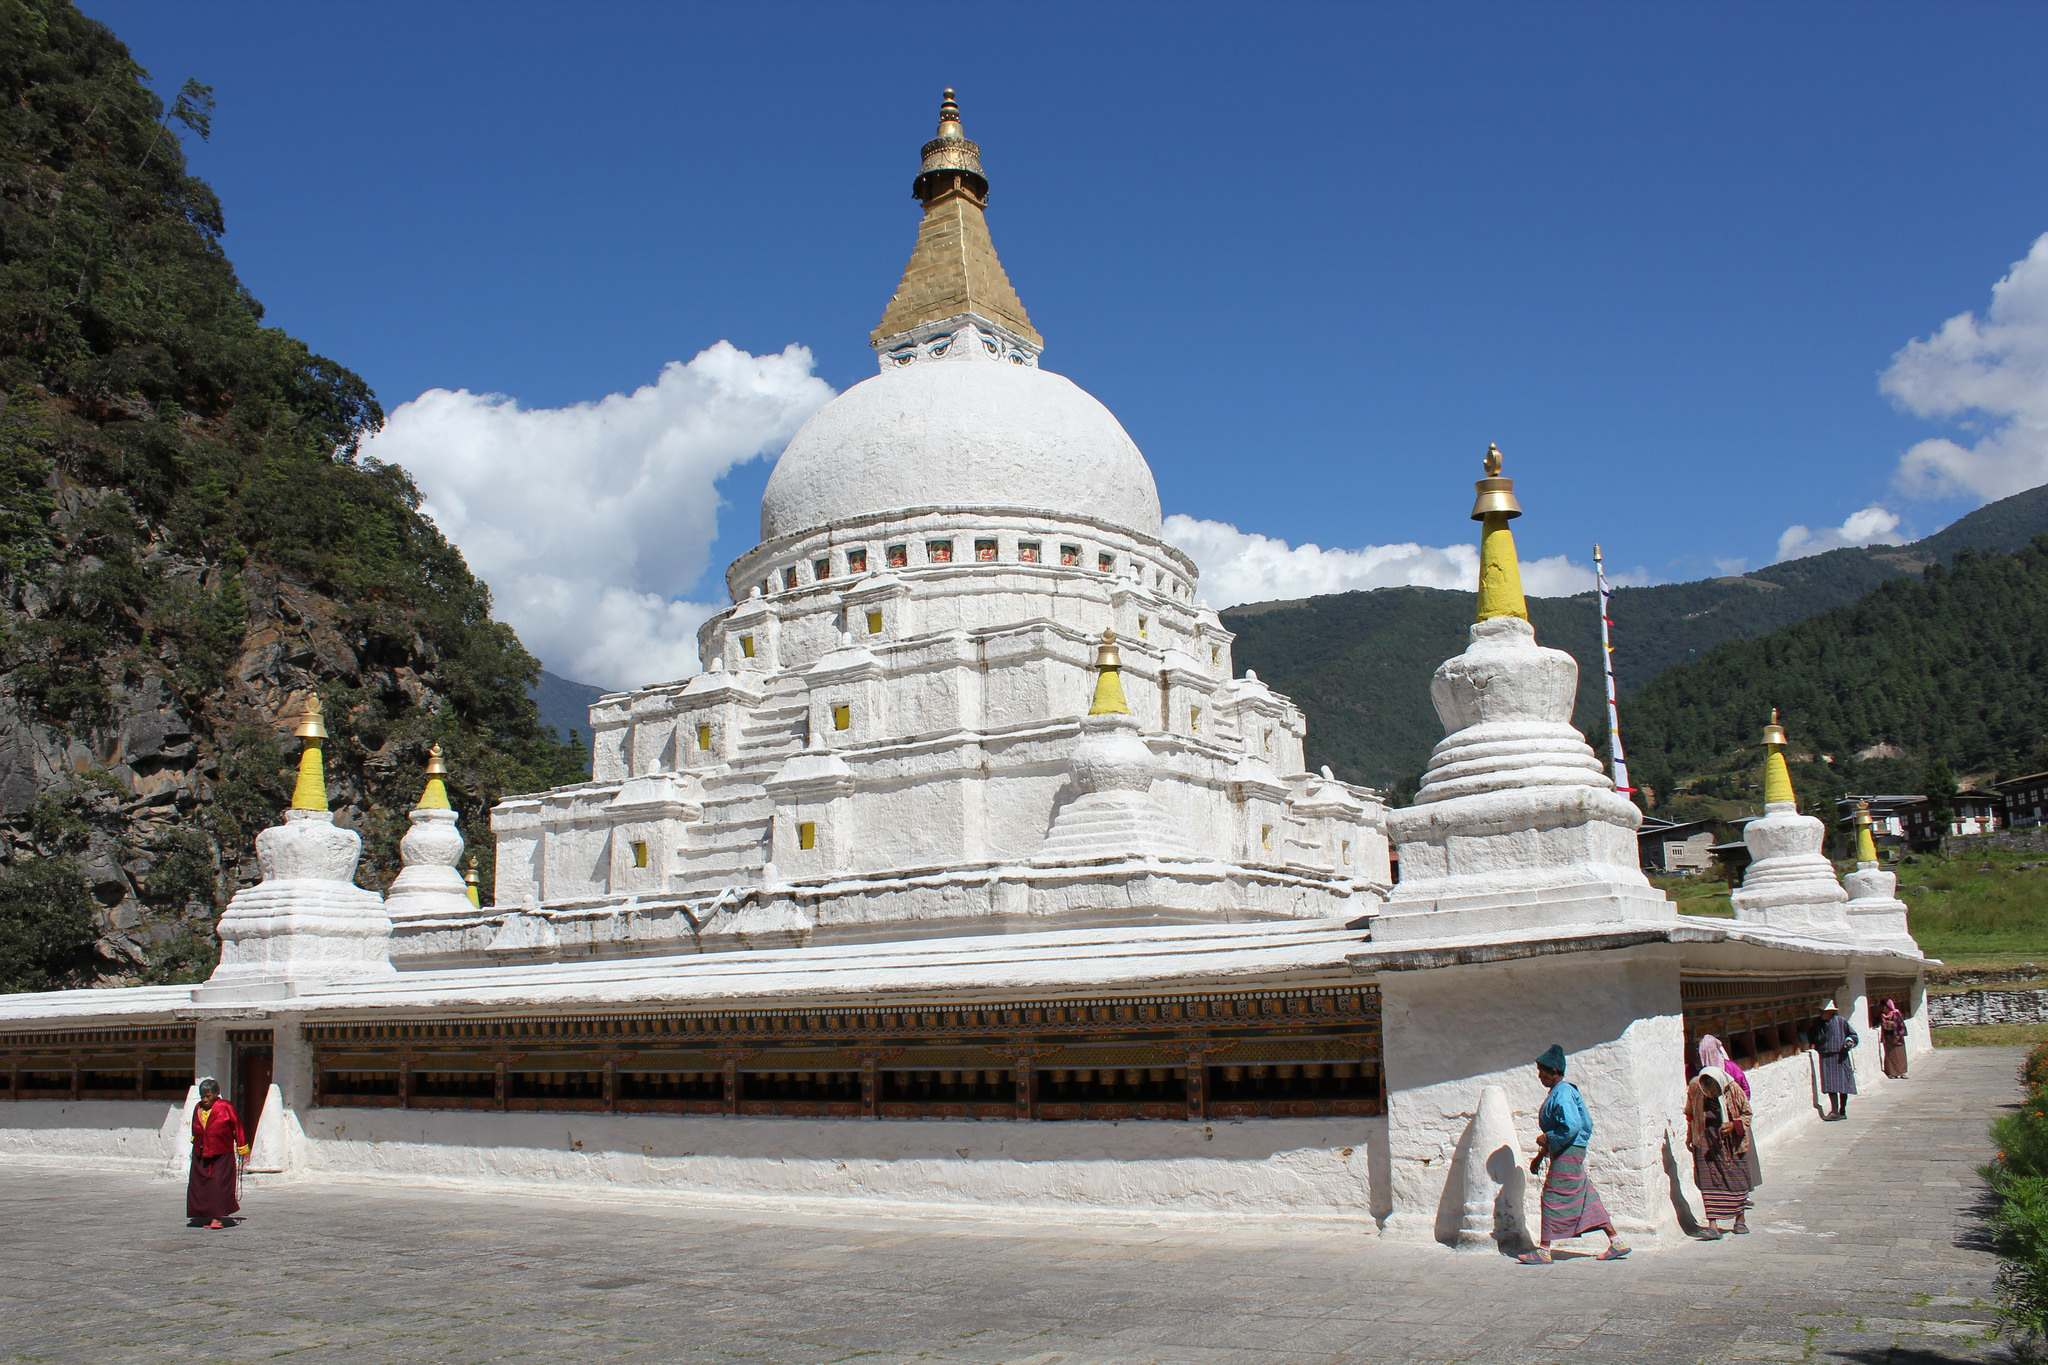 bhutan14 Bhutan   The Land of the Thunder Dragon